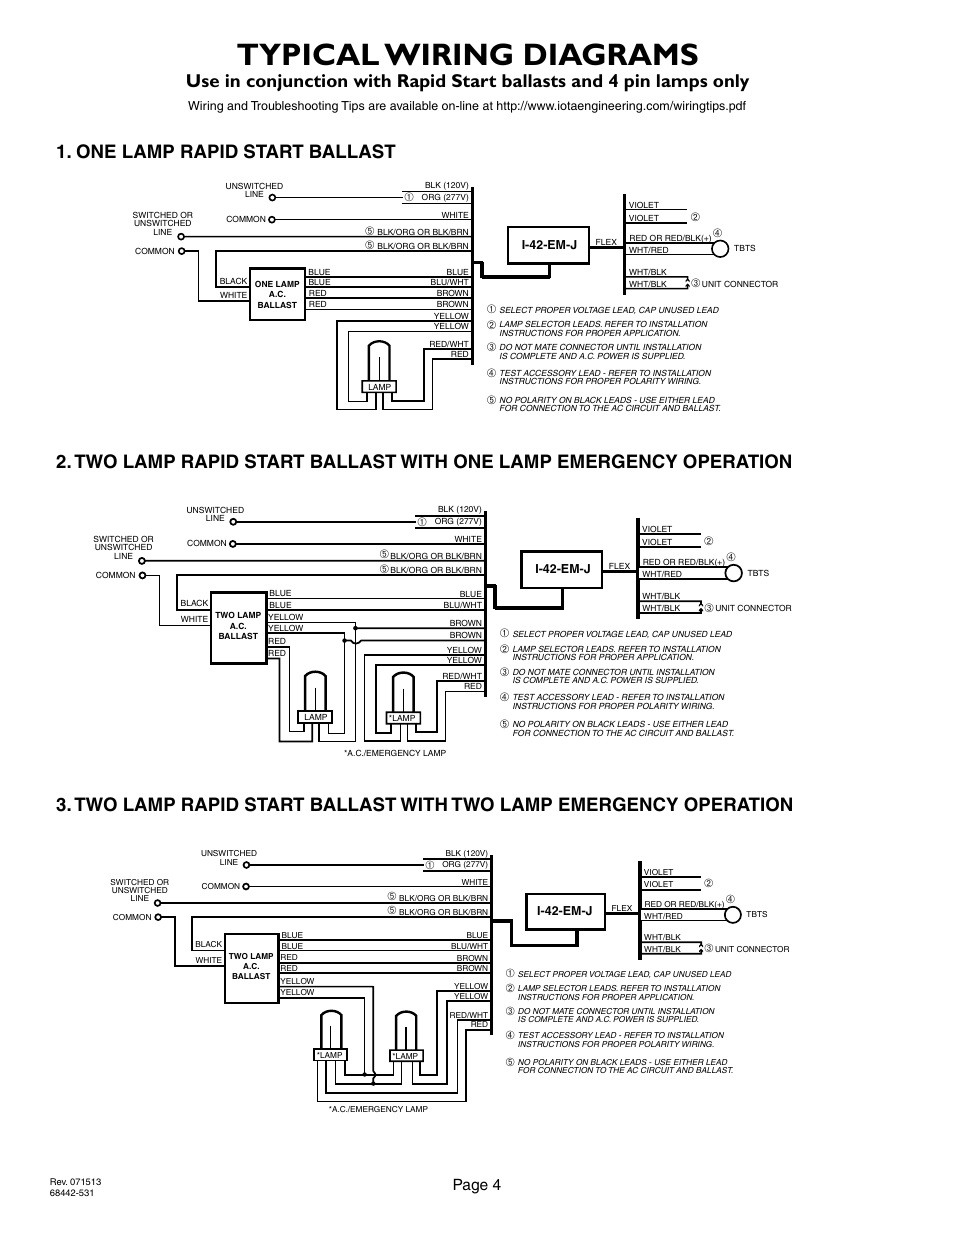 iota i 42 em j page4?resize\=665%2C861 iota i320 emergency ballast wiring diagram 277 lighting wiring iota isl 540 wiring diagram at readyjetset.co